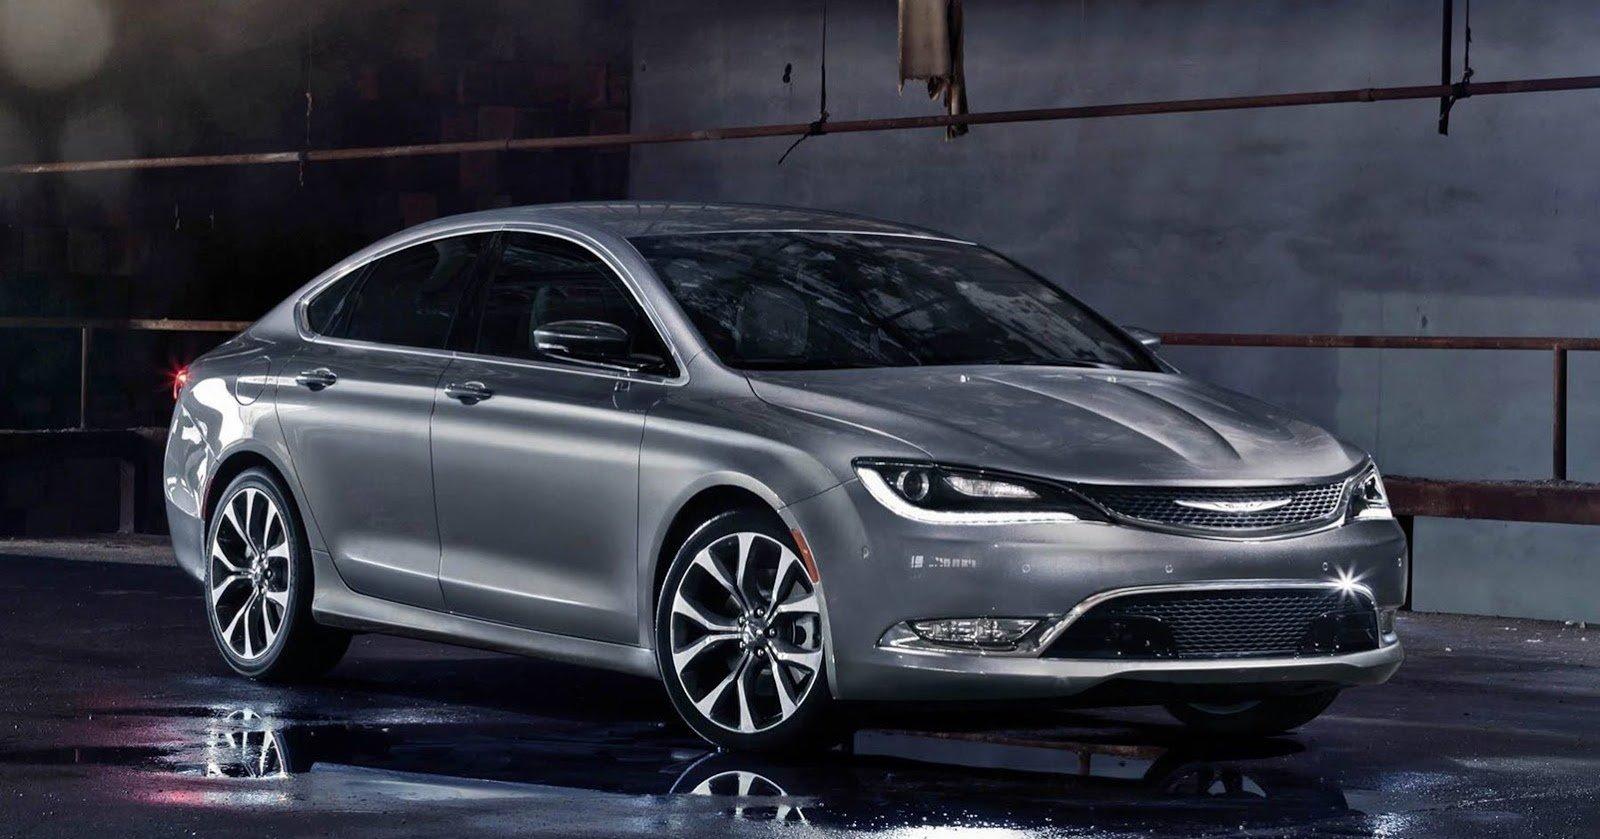 2015 chrysler 200 new american d segment sedan paul tan. Black Bedroom Furniture Sets. Home Design Ideas